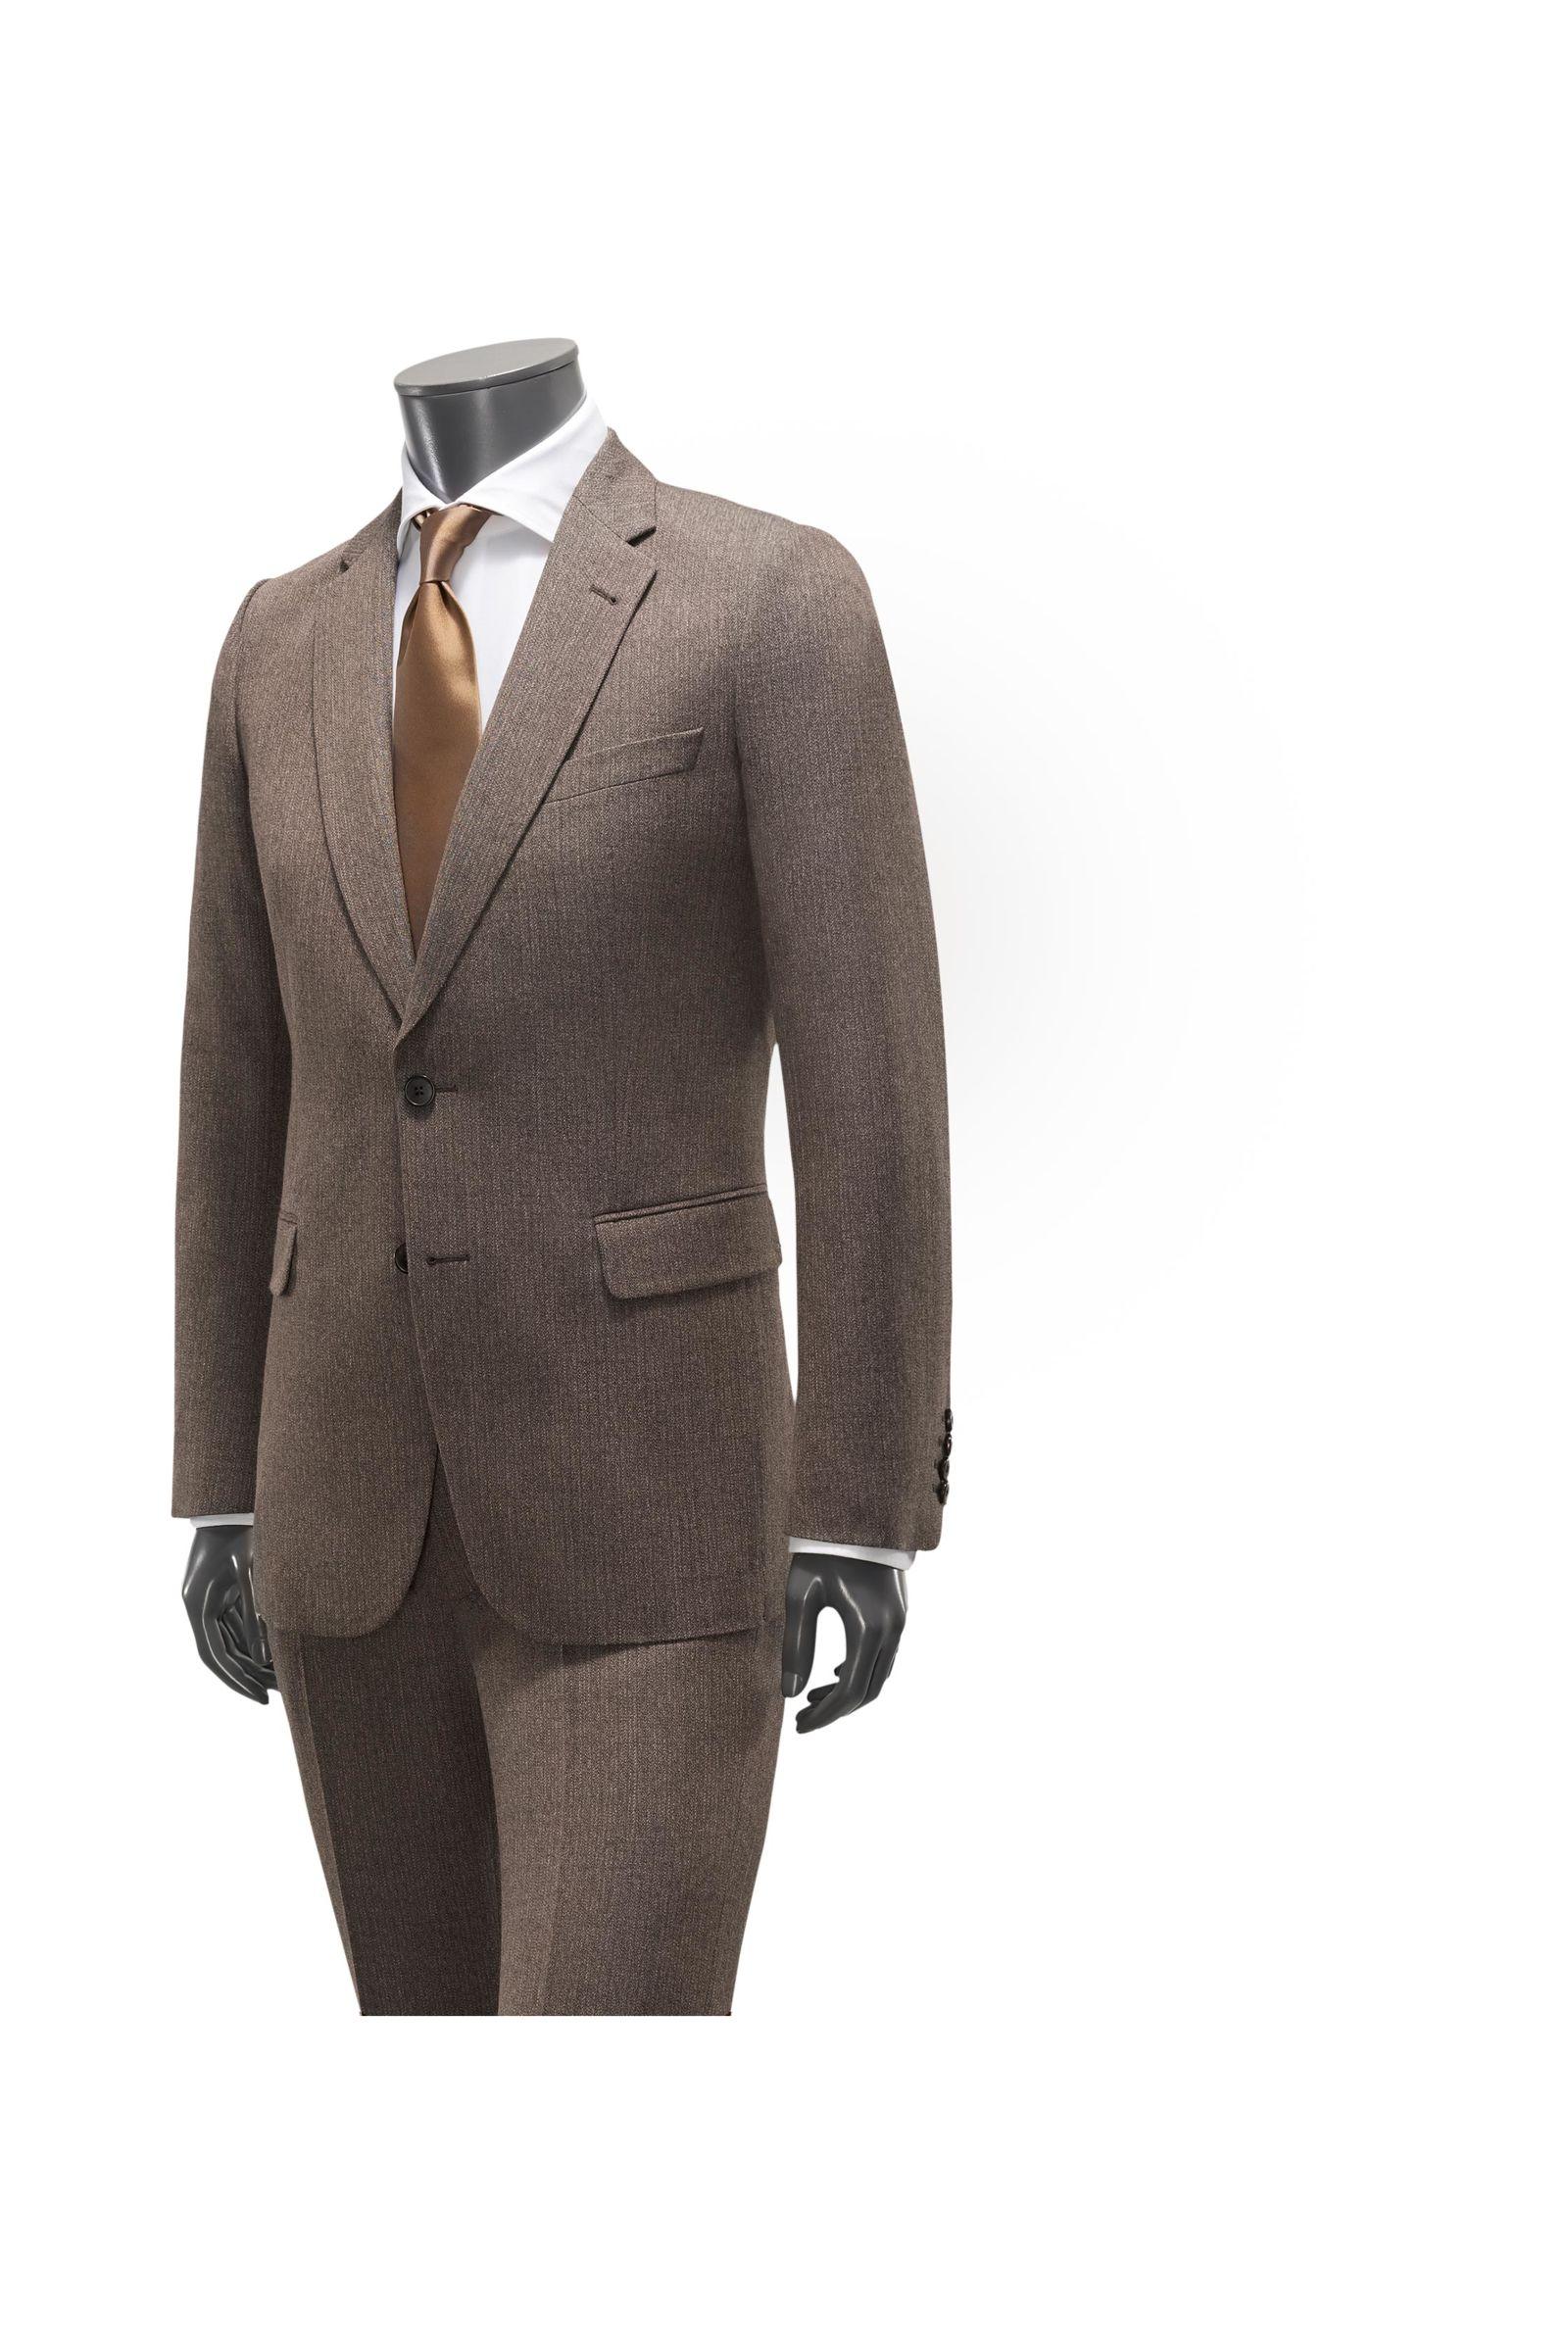 Anzug 'Kline' graubraun gestreift